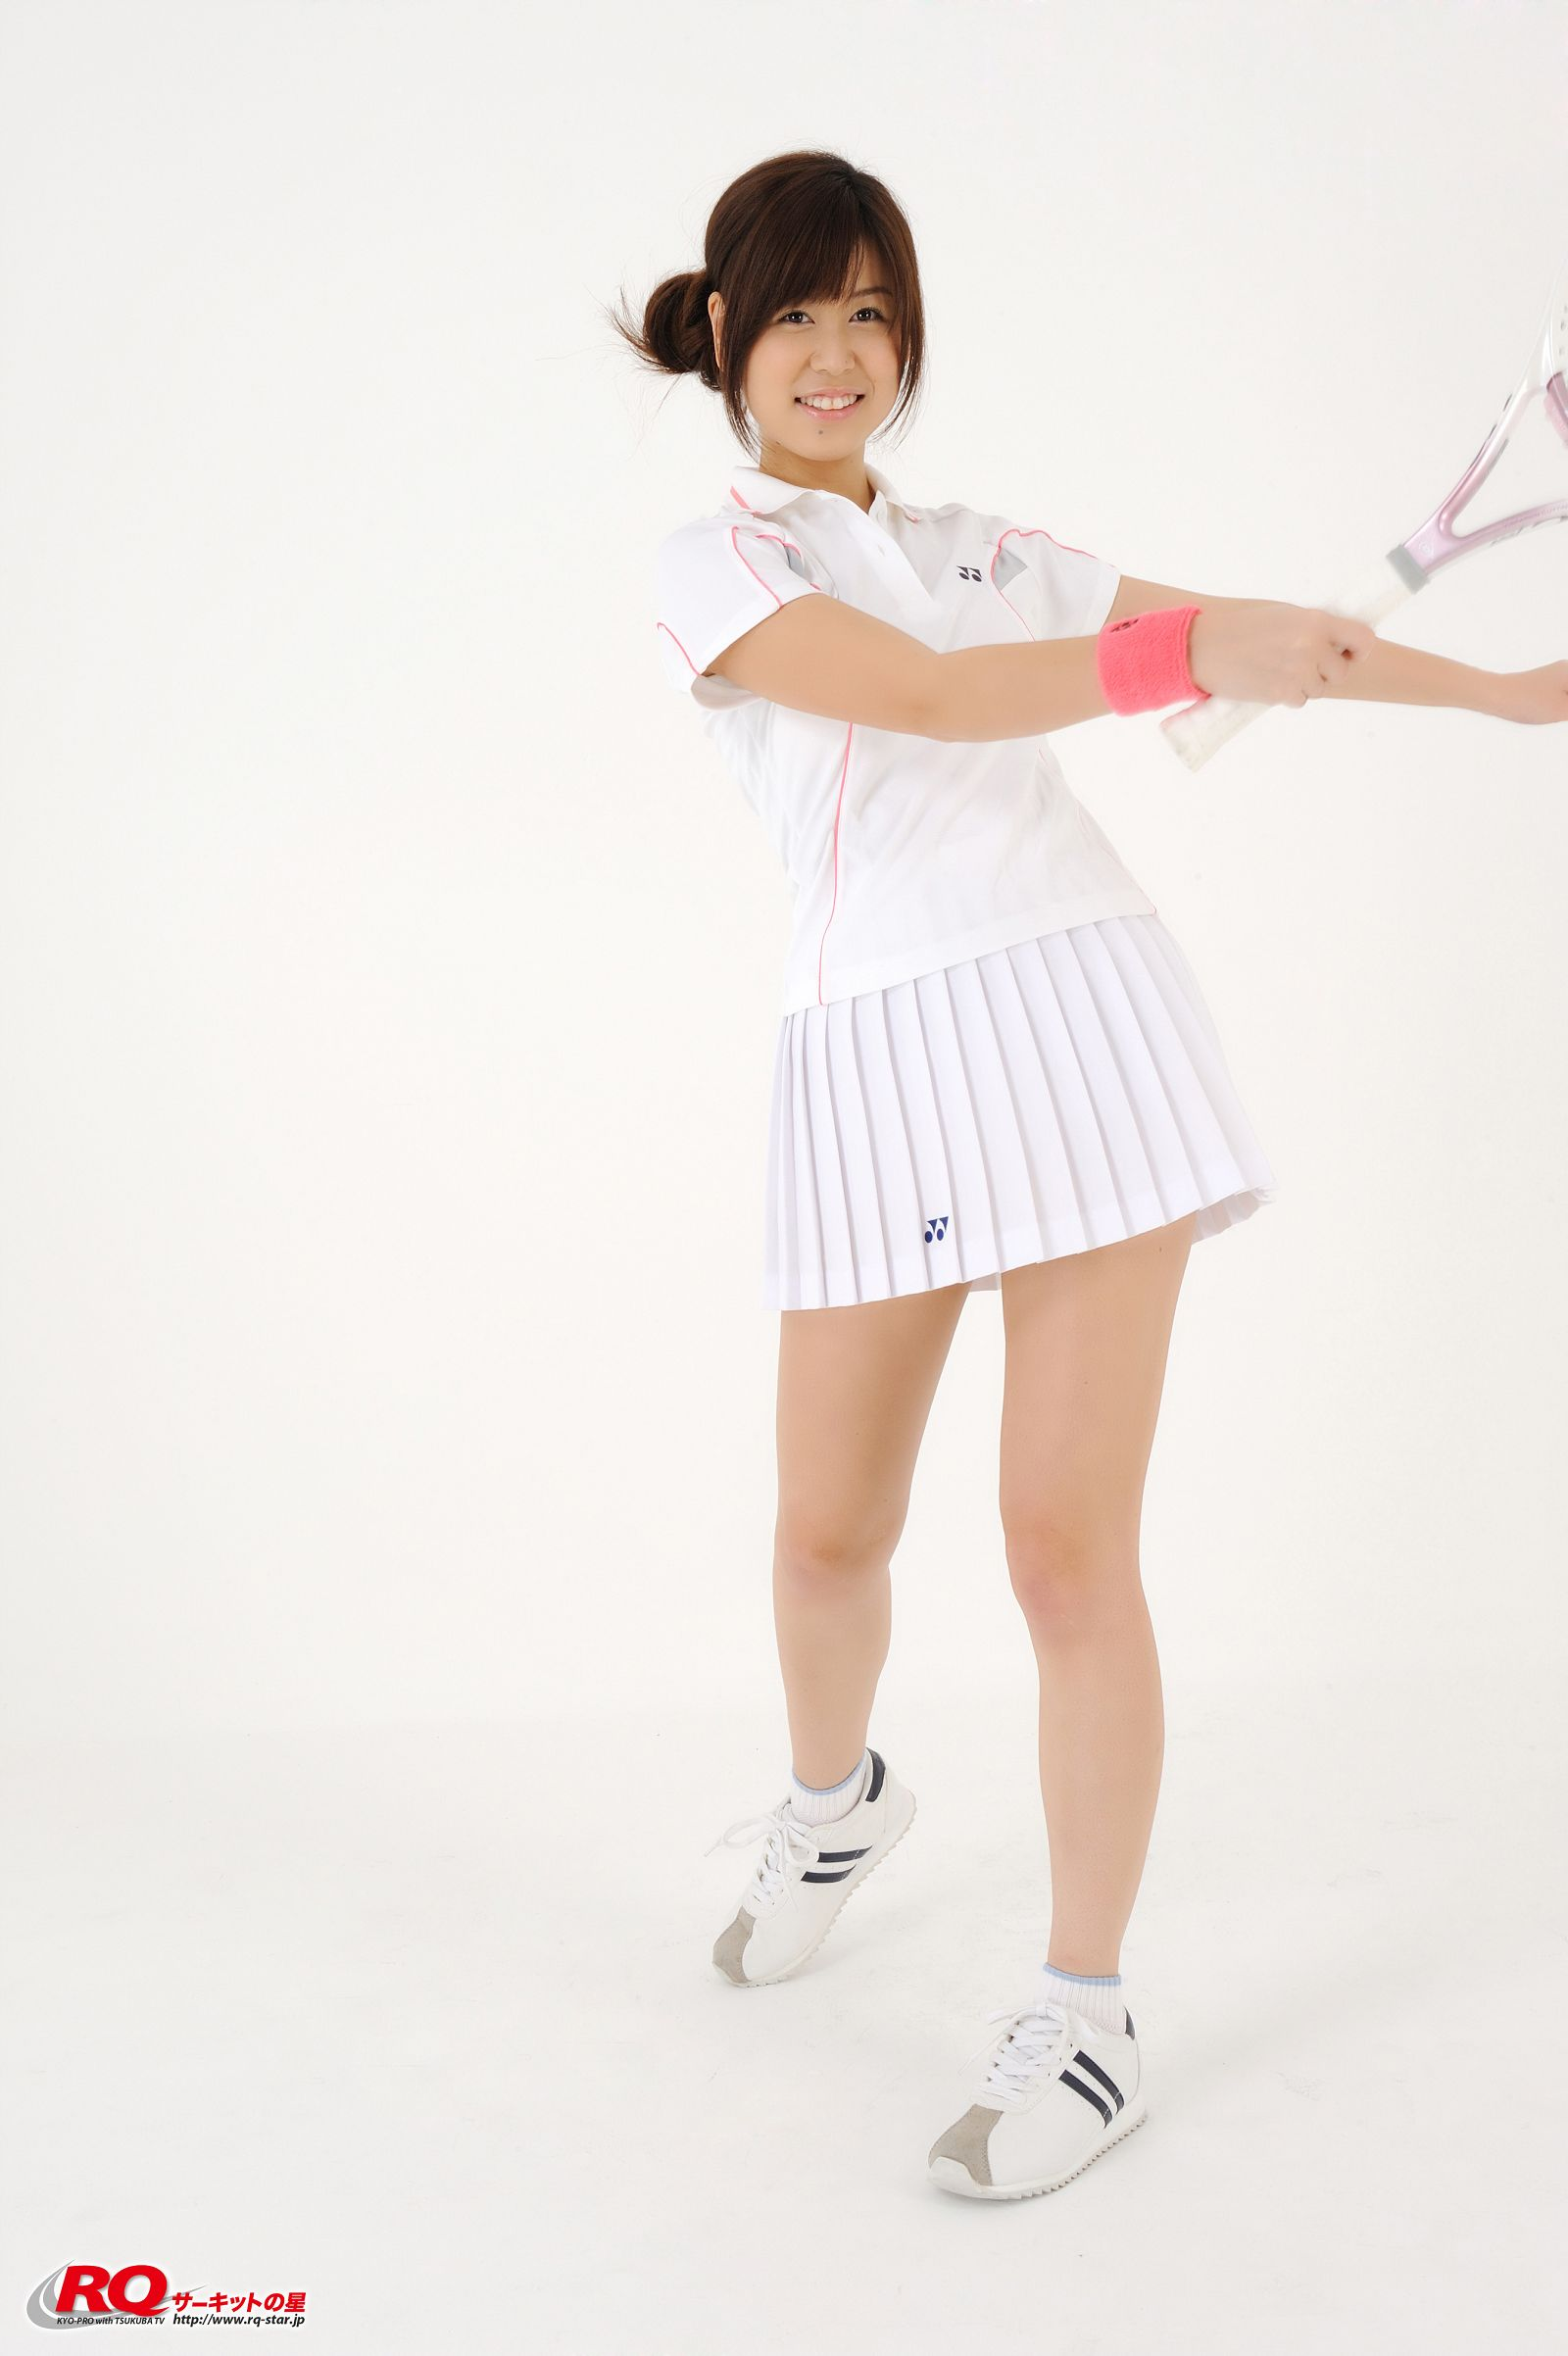 [RQ STAR美女] NO.01120 Airi Nagasaku 永作あいり Tennis Wea[50P] RQ STAR 第2张